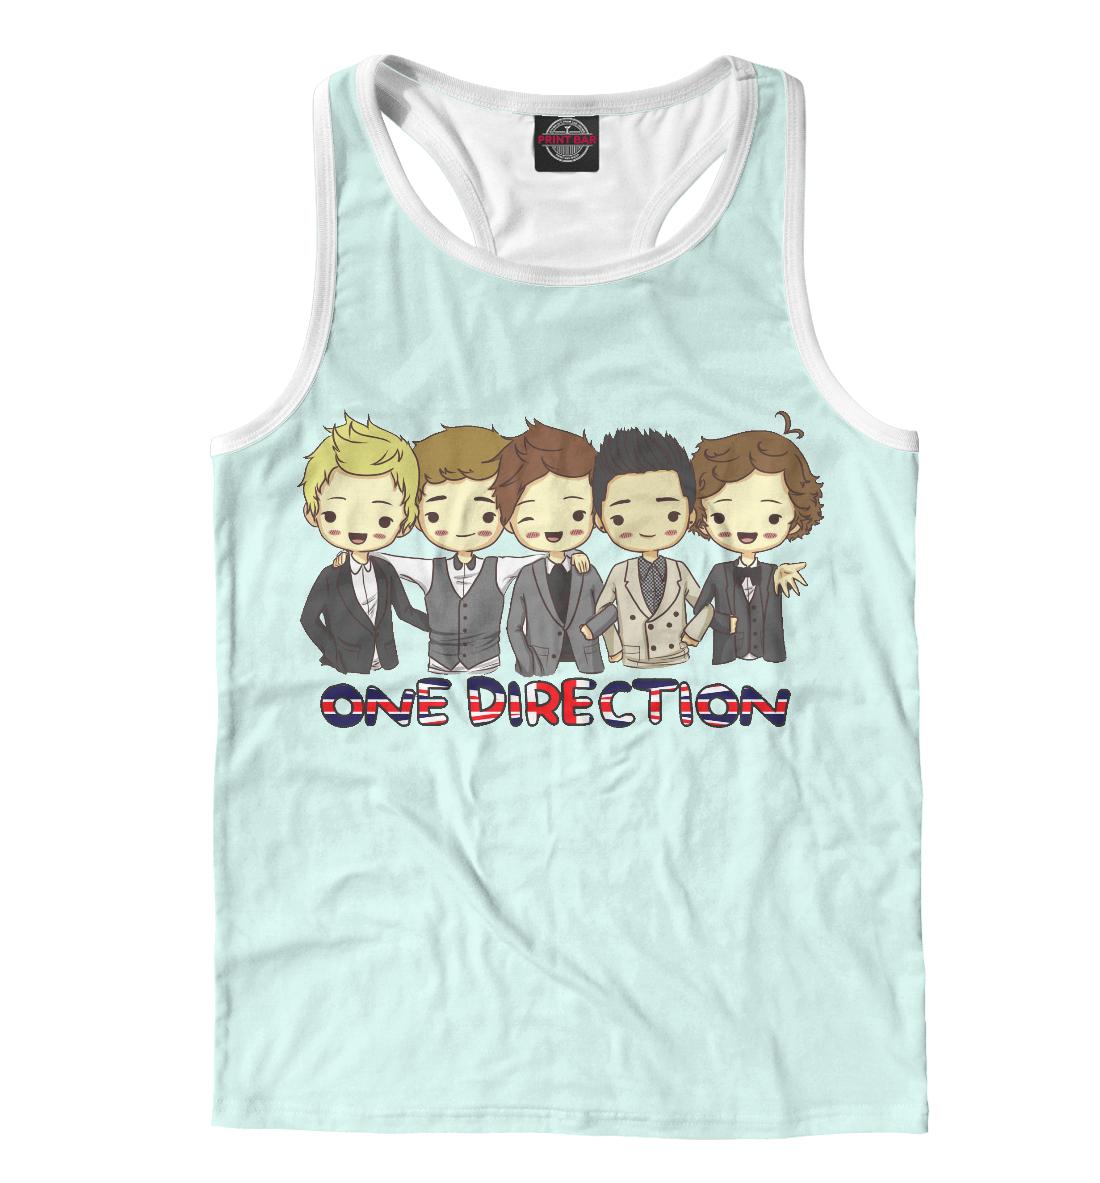 Купить One Direction, Printbar, Майки борцовки, OND-456603-mayb-2